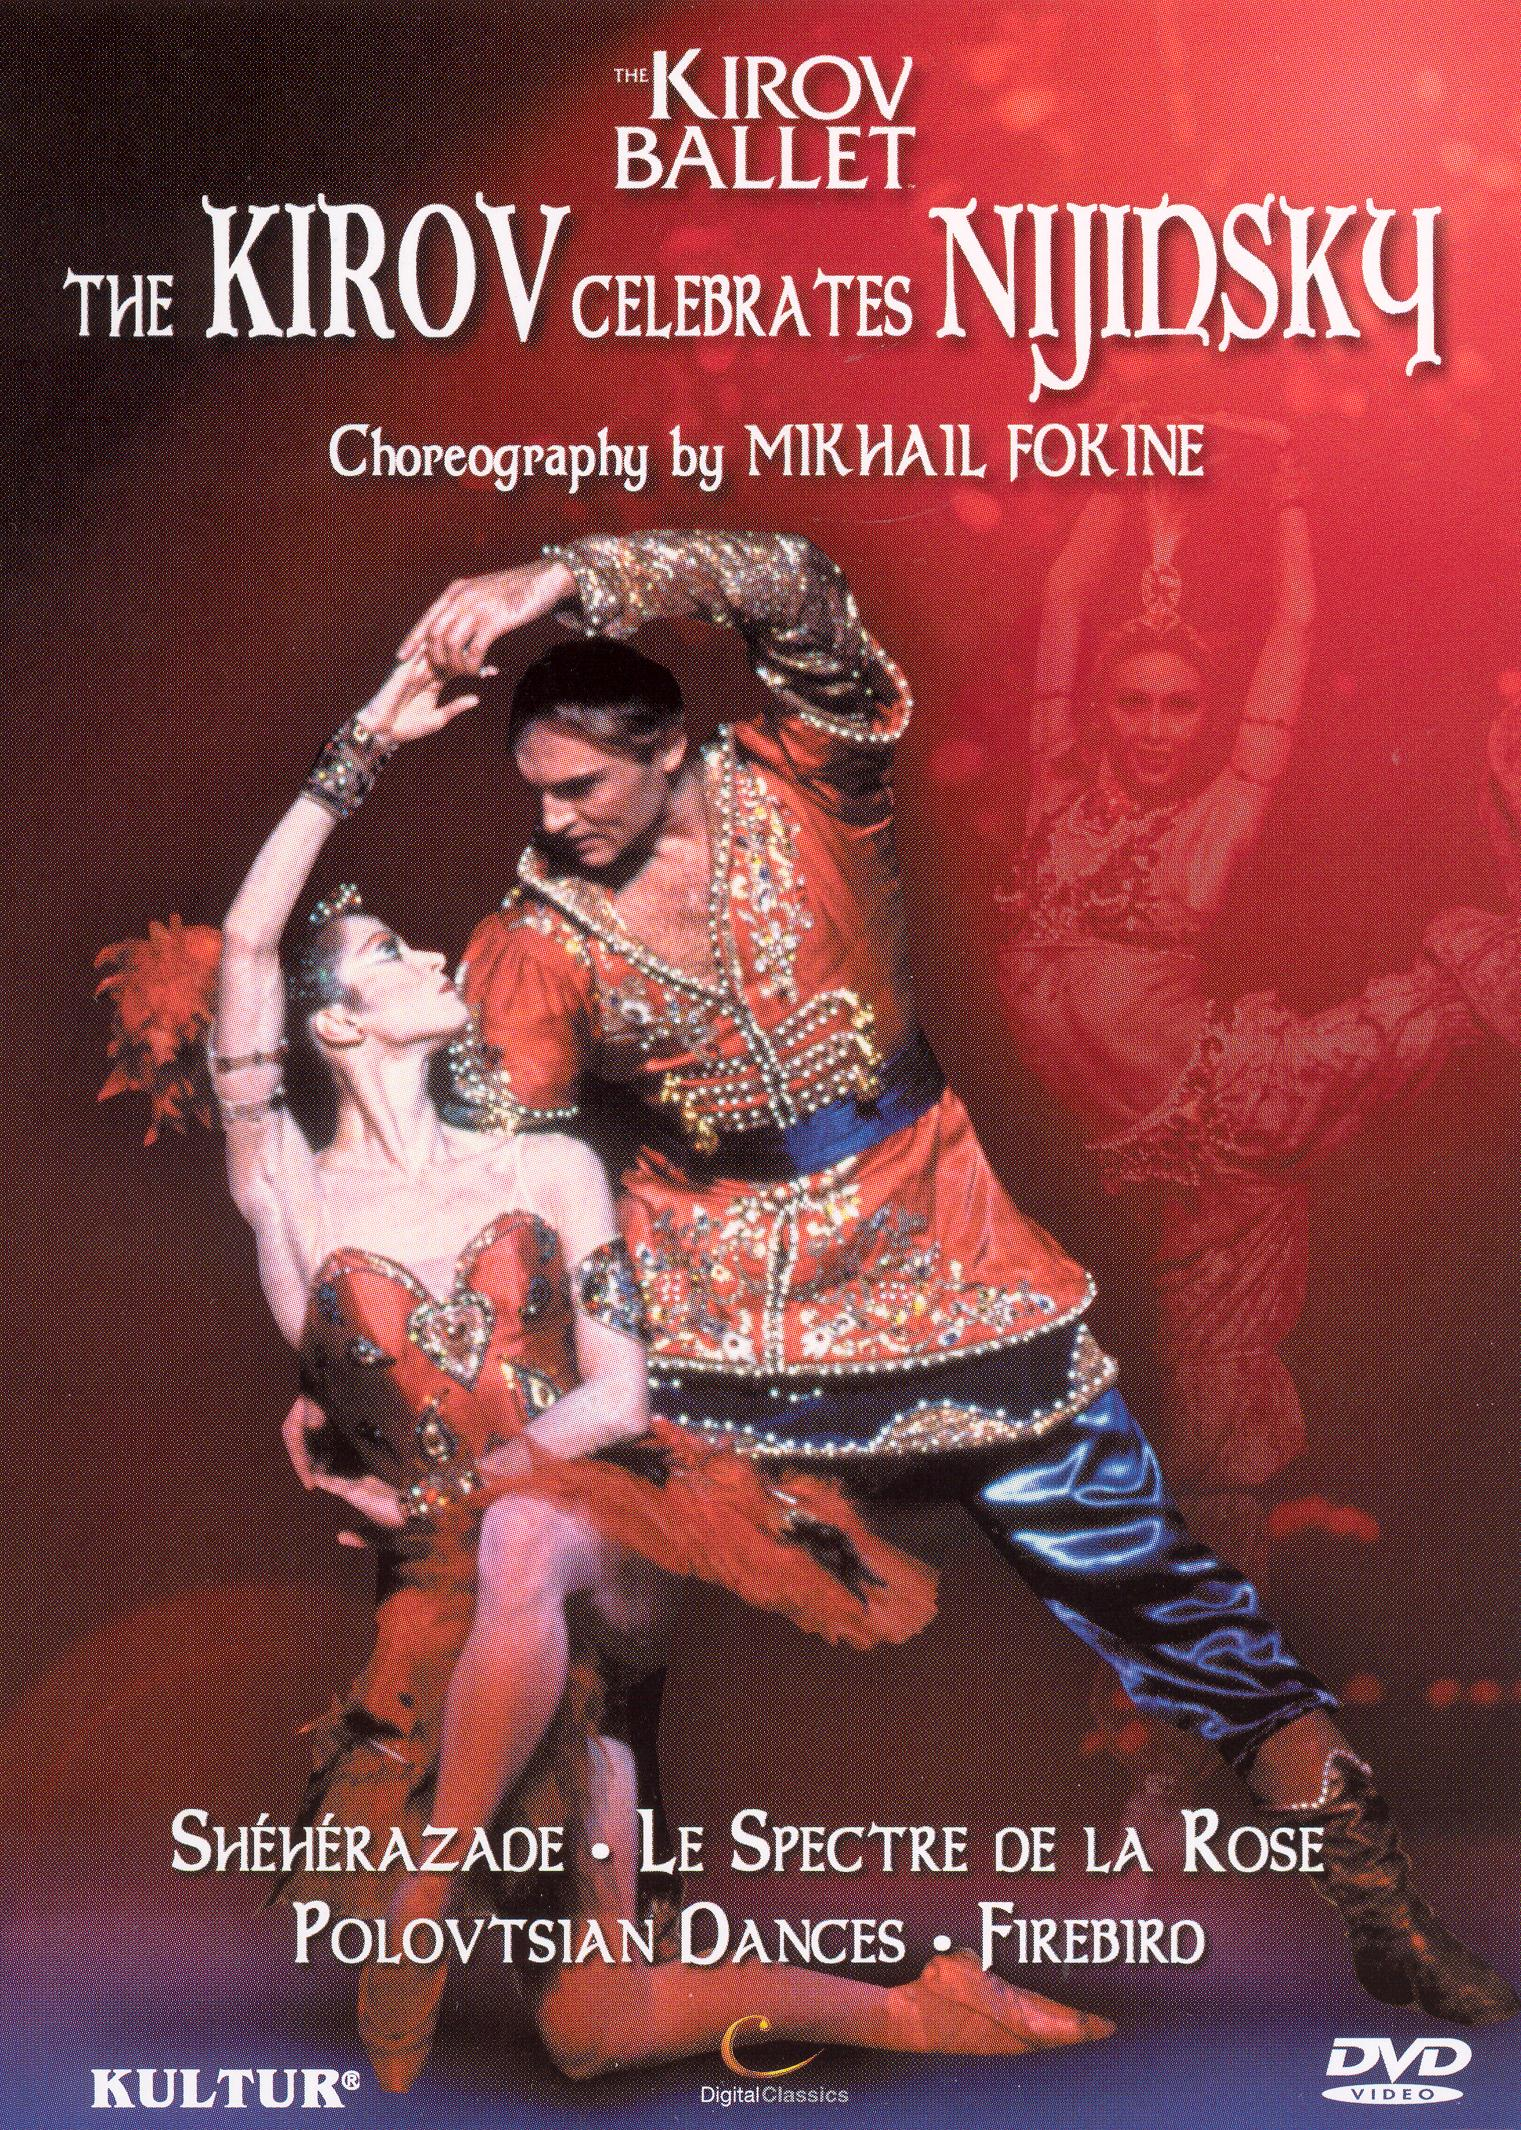 The Kirov Celebrates Nijinsky